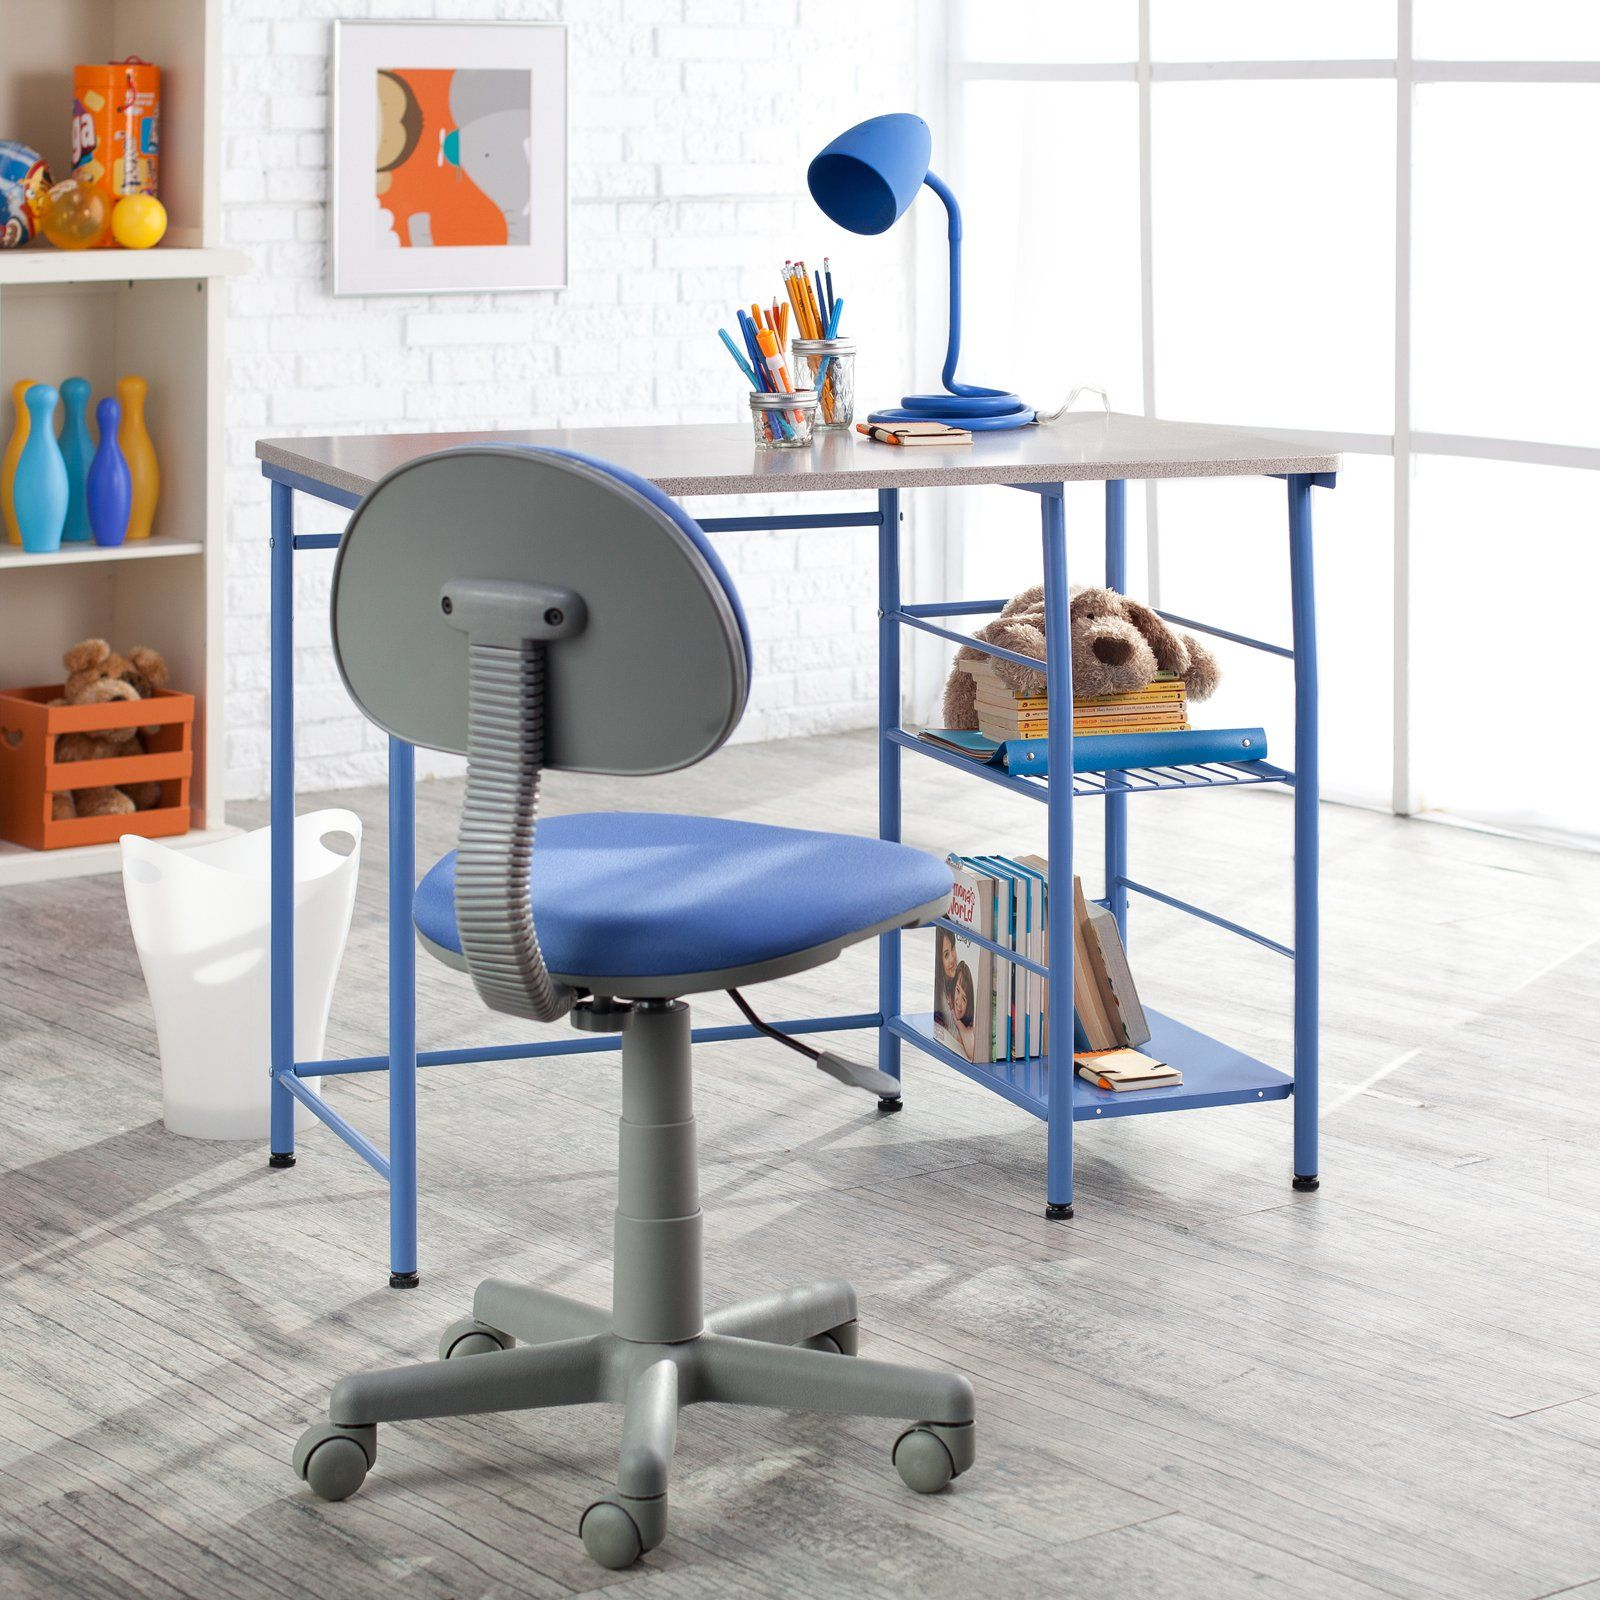 Study Zone II Desk & Chair - Blue